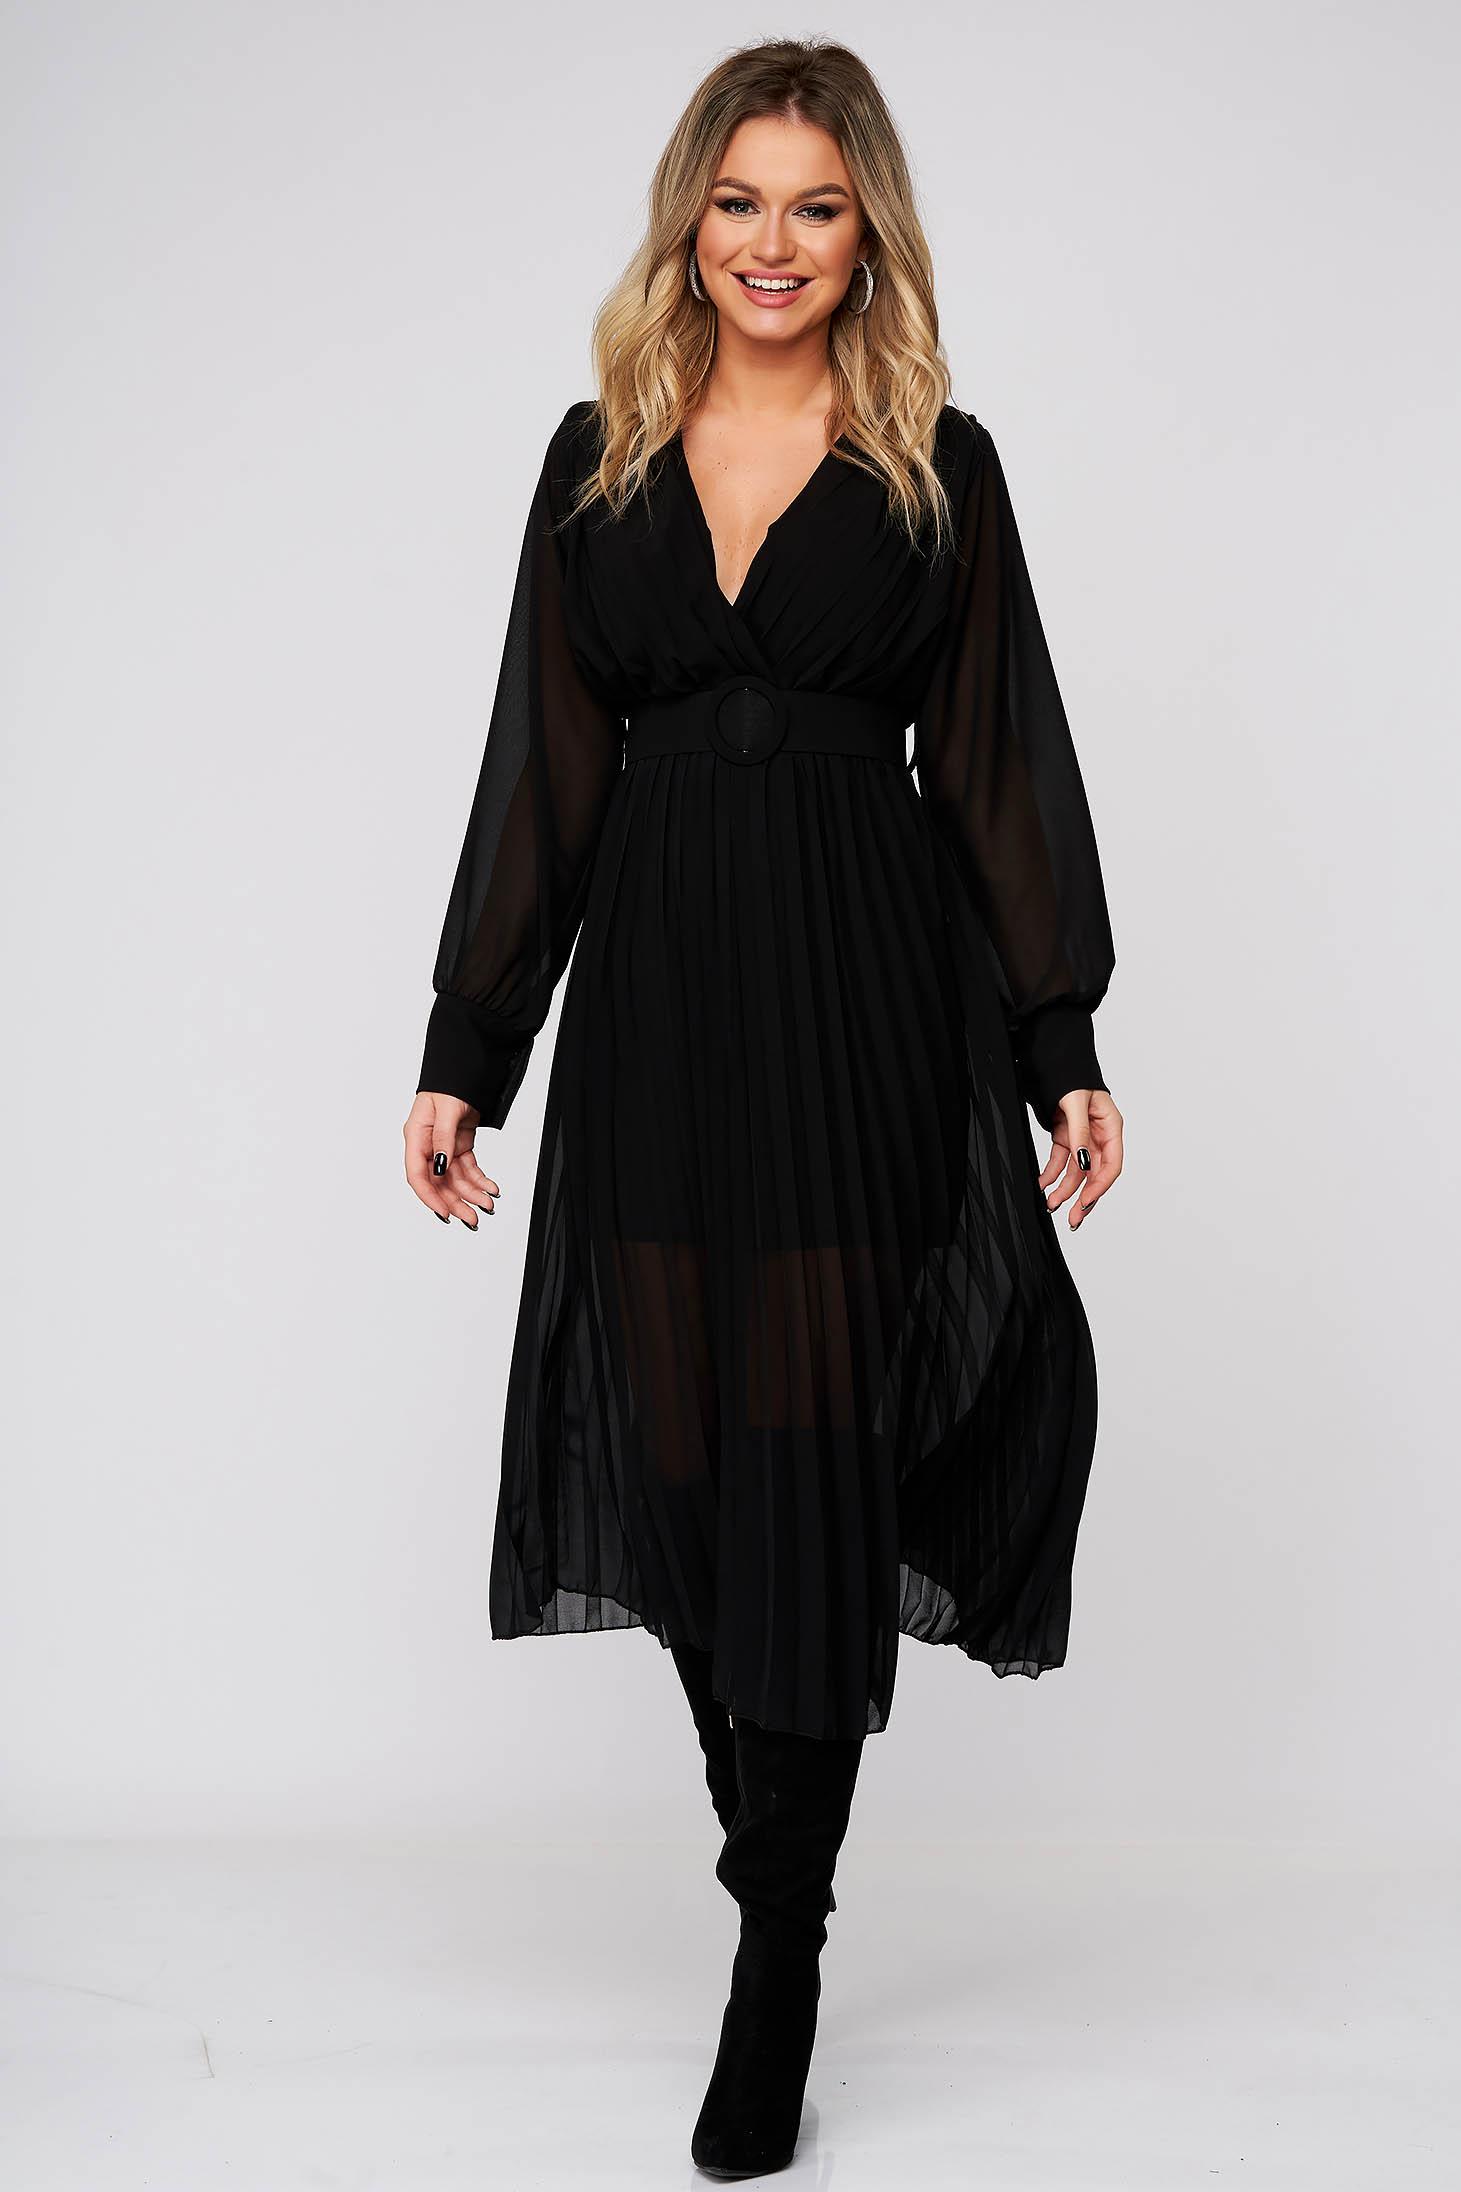 Rochie SunShine neagra eleganta midi din voal plisat in clos cu elastic in talie